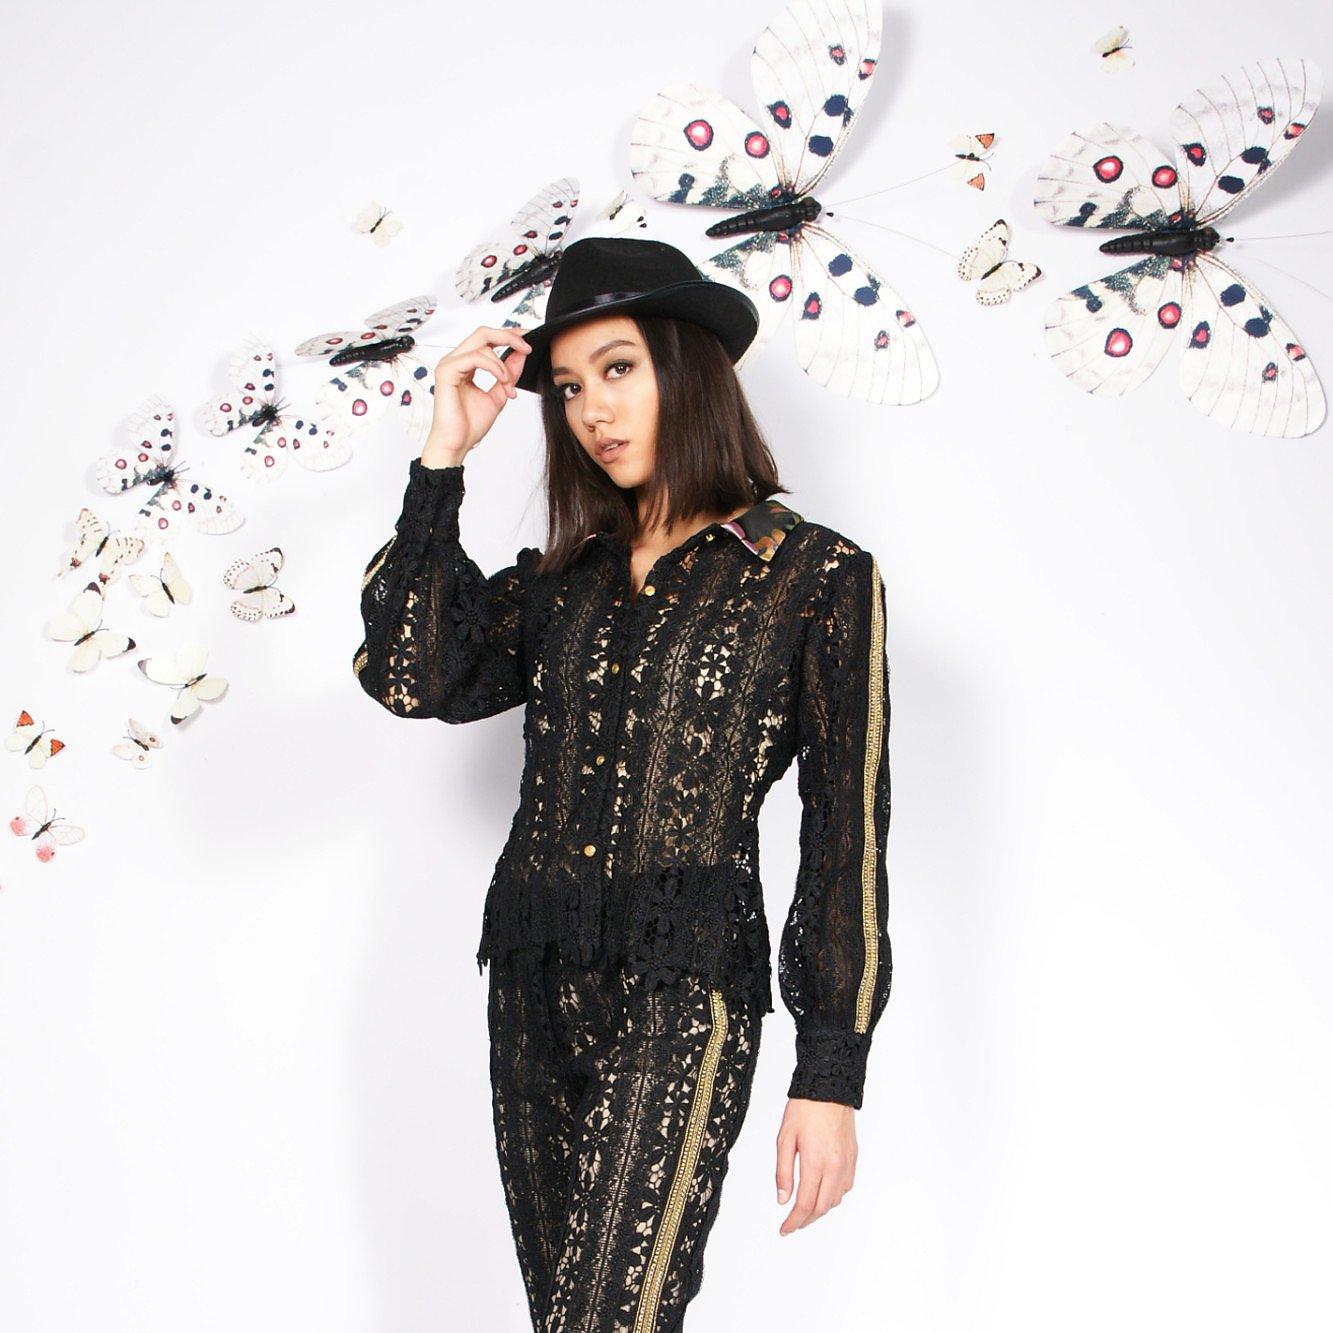 Syra J Crochet Blazer With Sleeve Piping